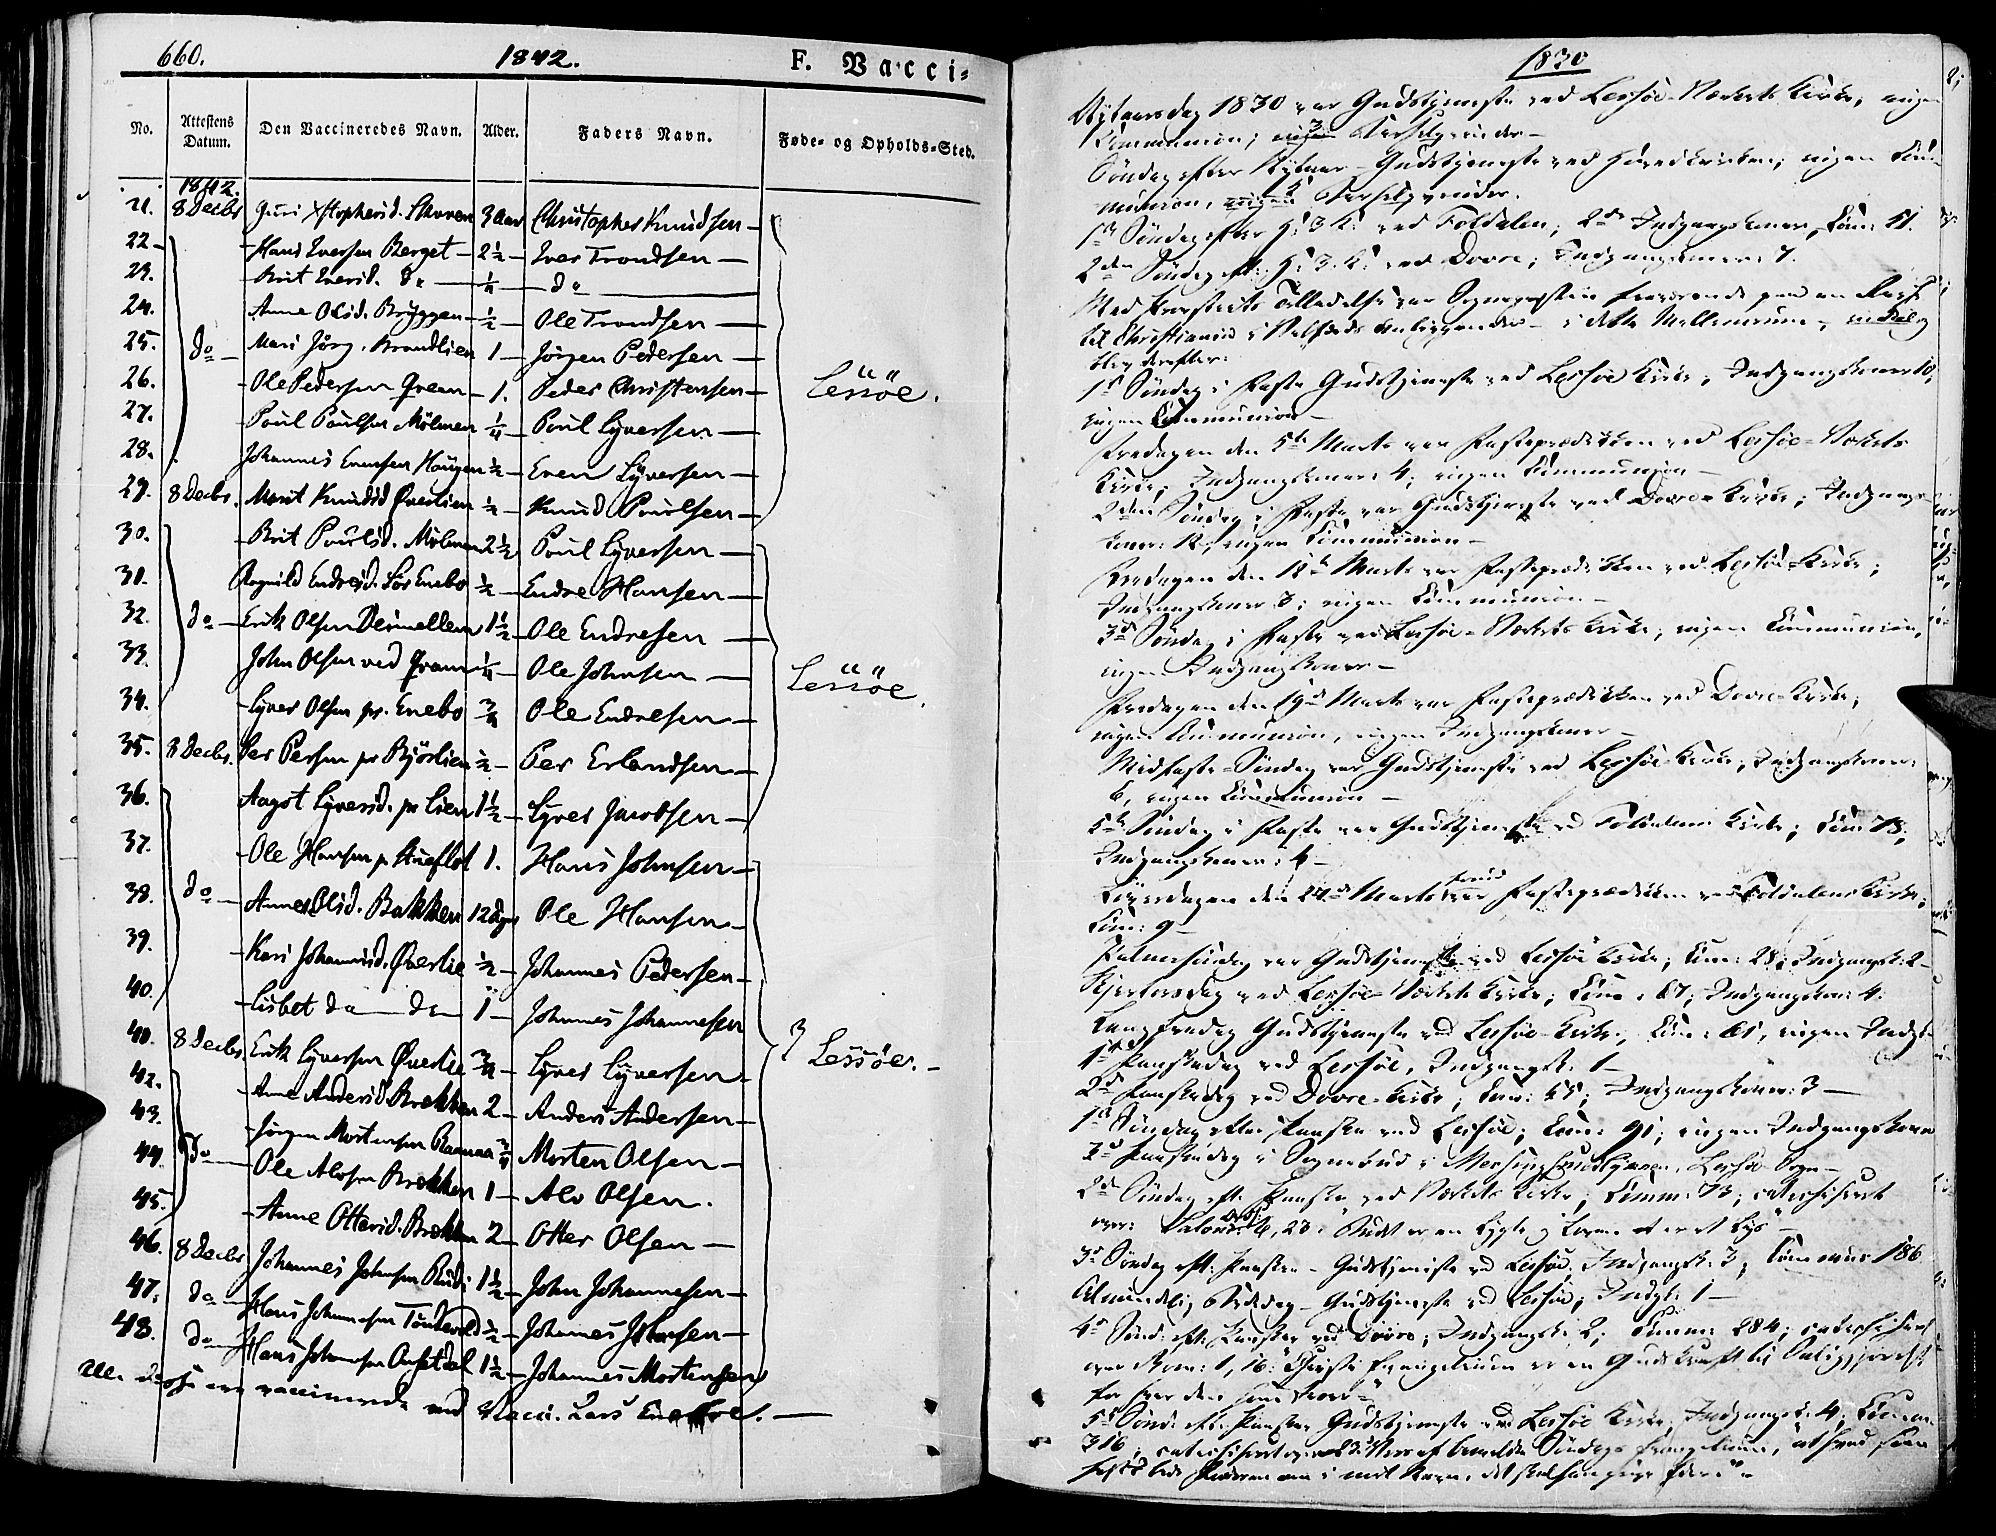 SAH, Lesja prestekontor, Ministerialbok nr. 5, 1830-1842, s. 660